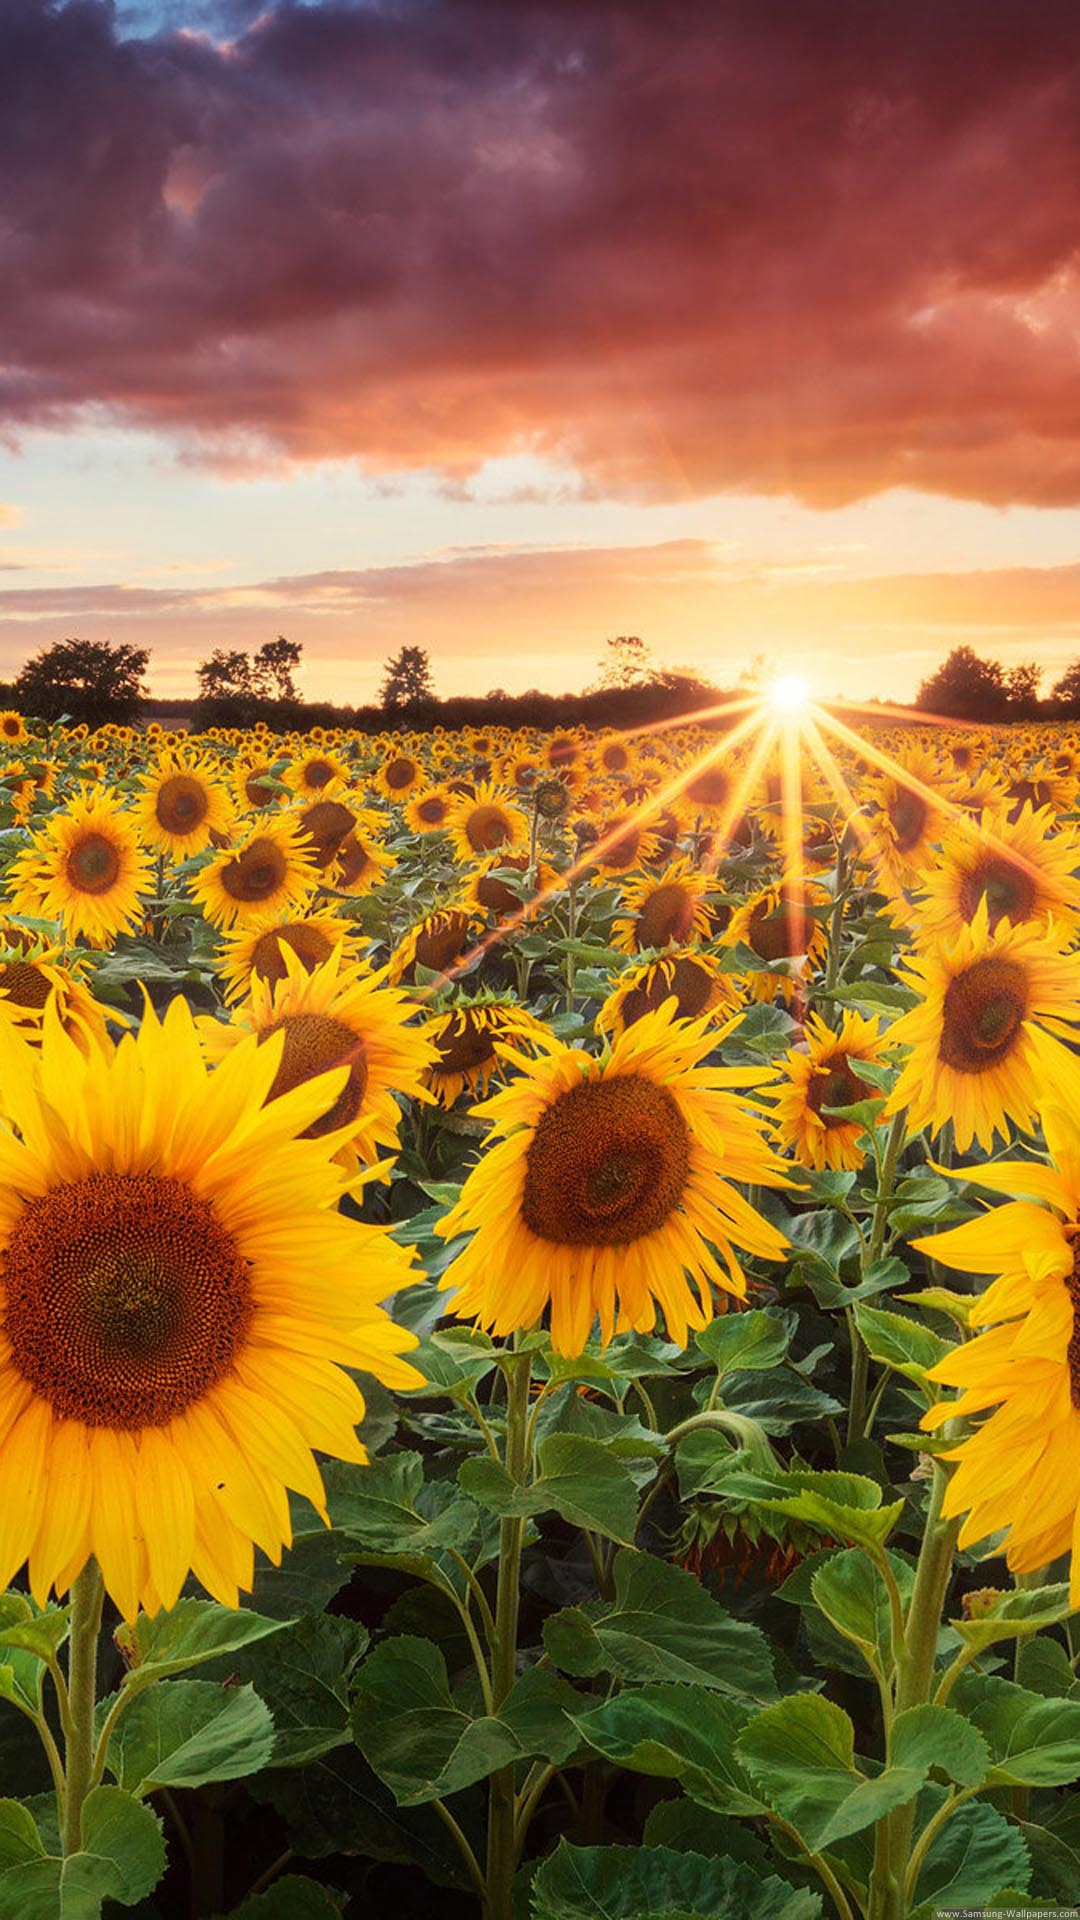 46 Sunflower Iphone 7 Plus Wallpaper On Wallpapersafari